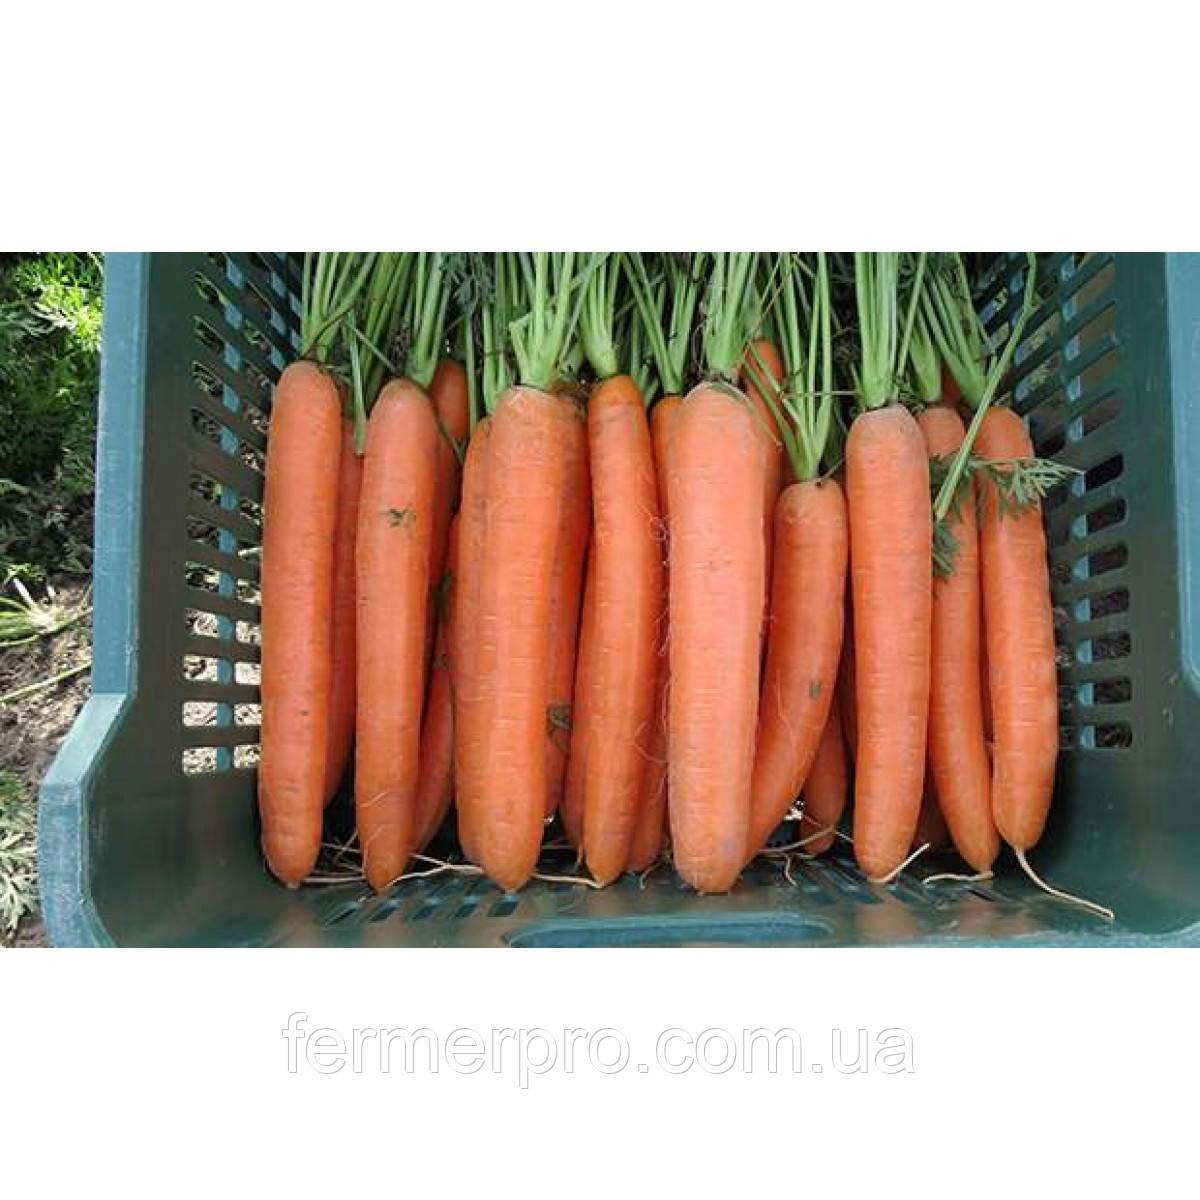 Семена моркови Дордонь F1 (фракция 1.6+ мм) 100000 семян Syngenta